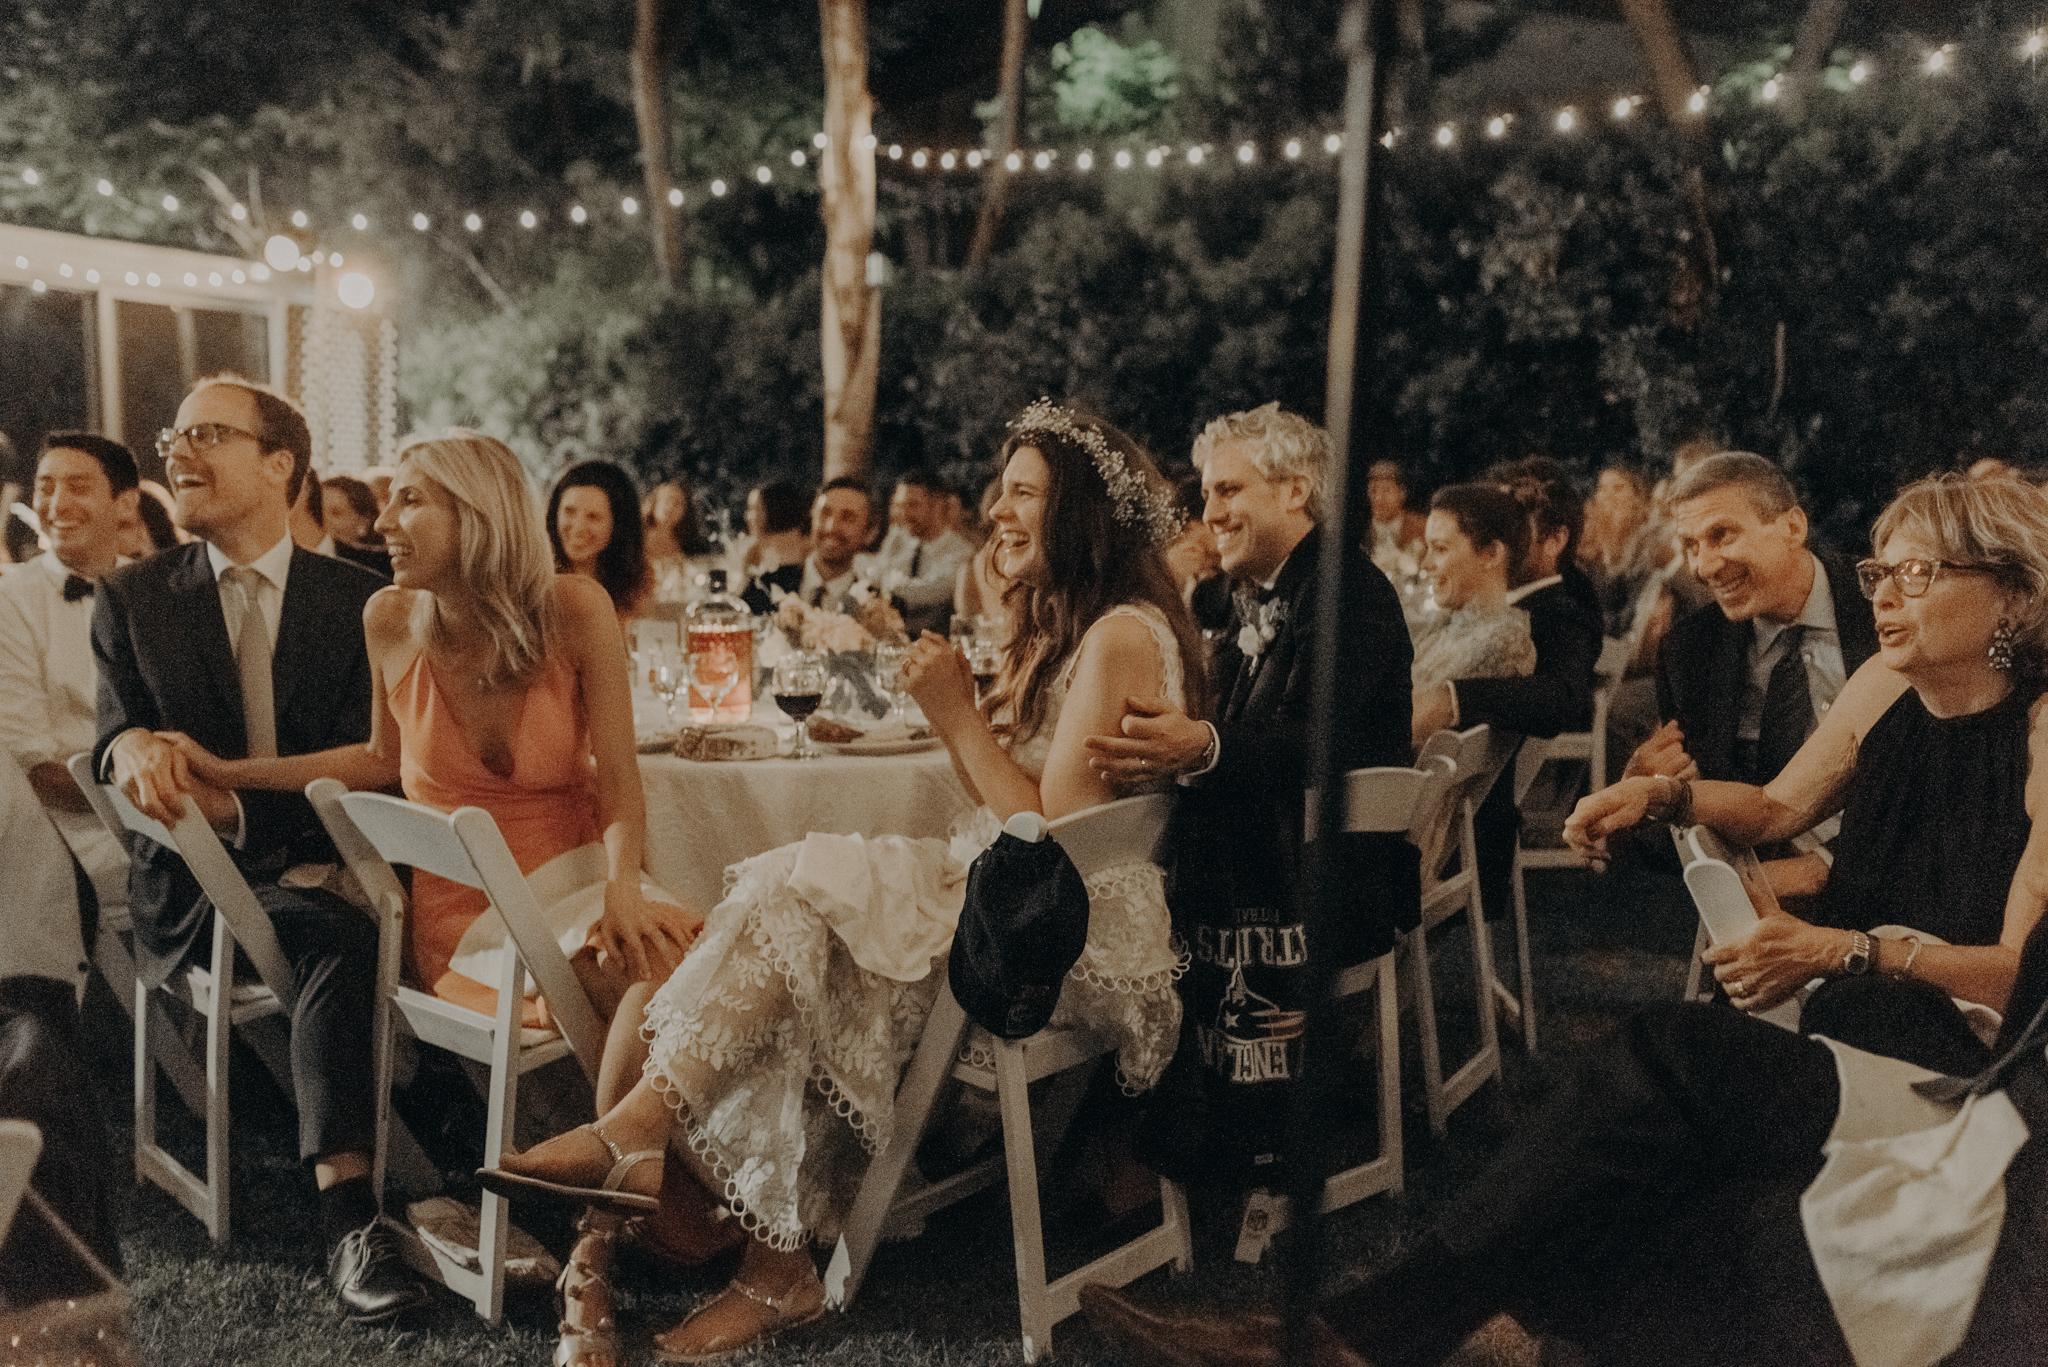 Isaiah + Taylor Photography - Private Estate Backyard Wedding - Beverly Hills - Los Angeles Wedding Photographer - 133.jpg